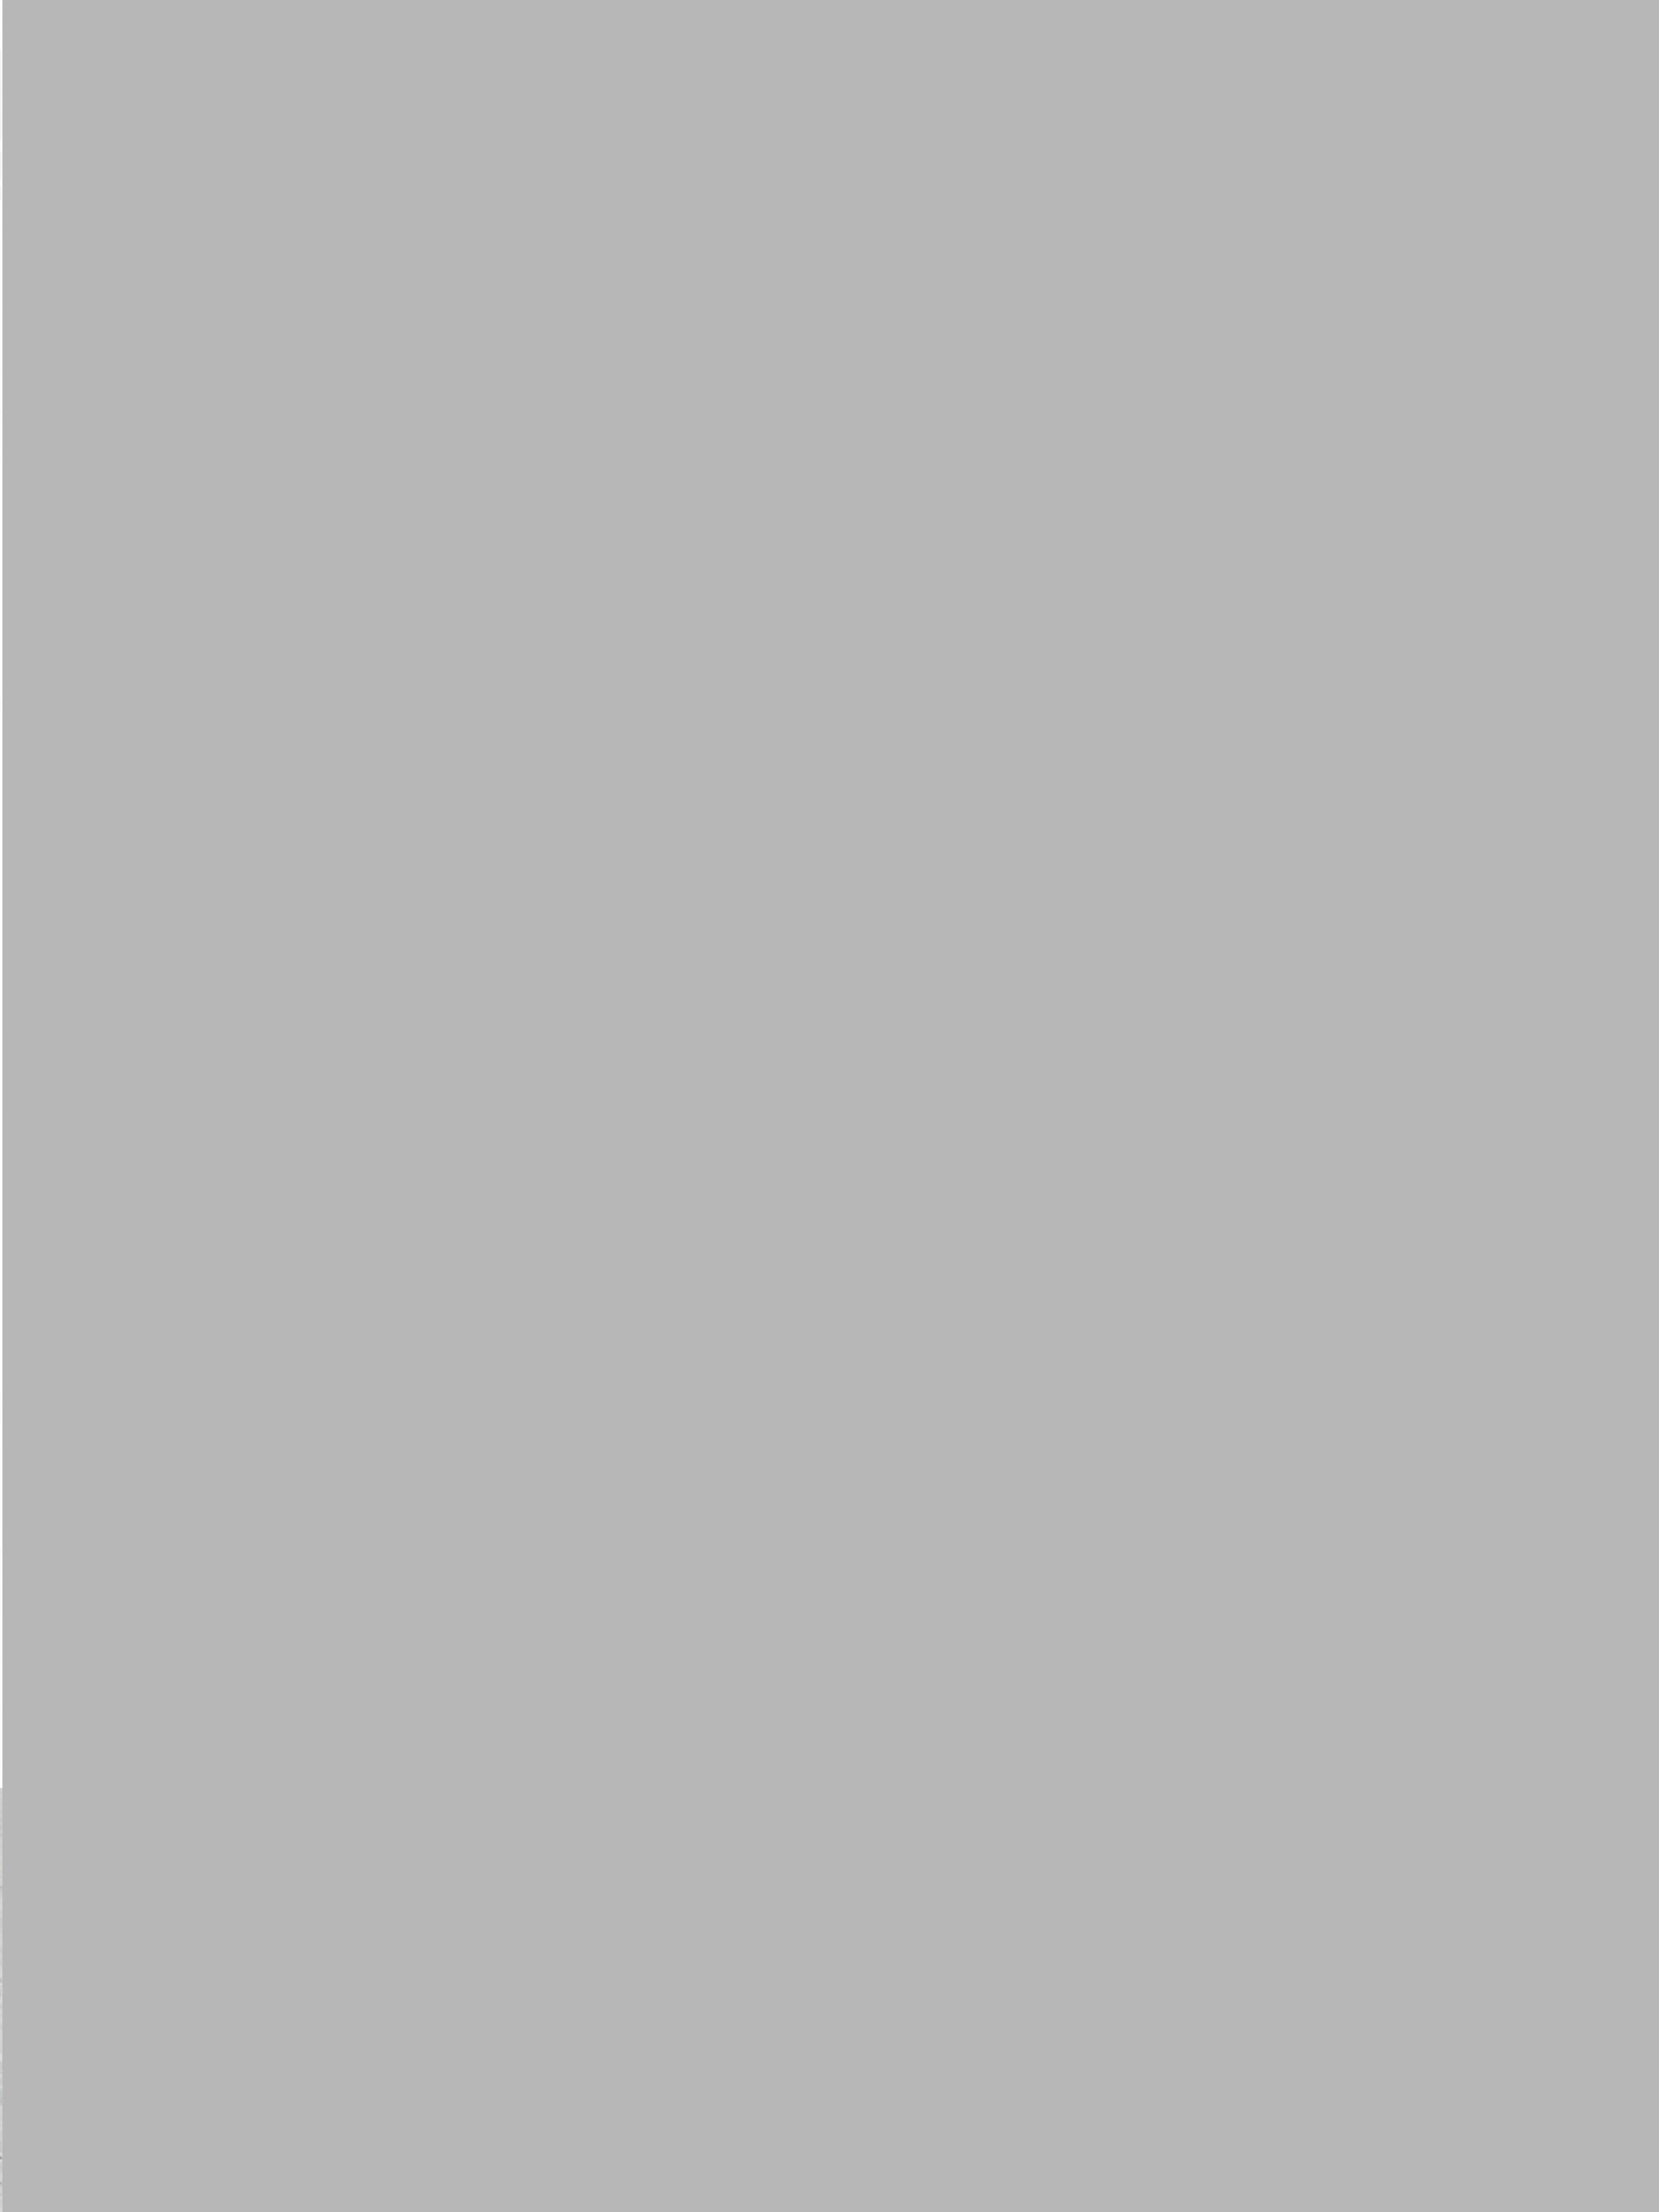 img blank grey